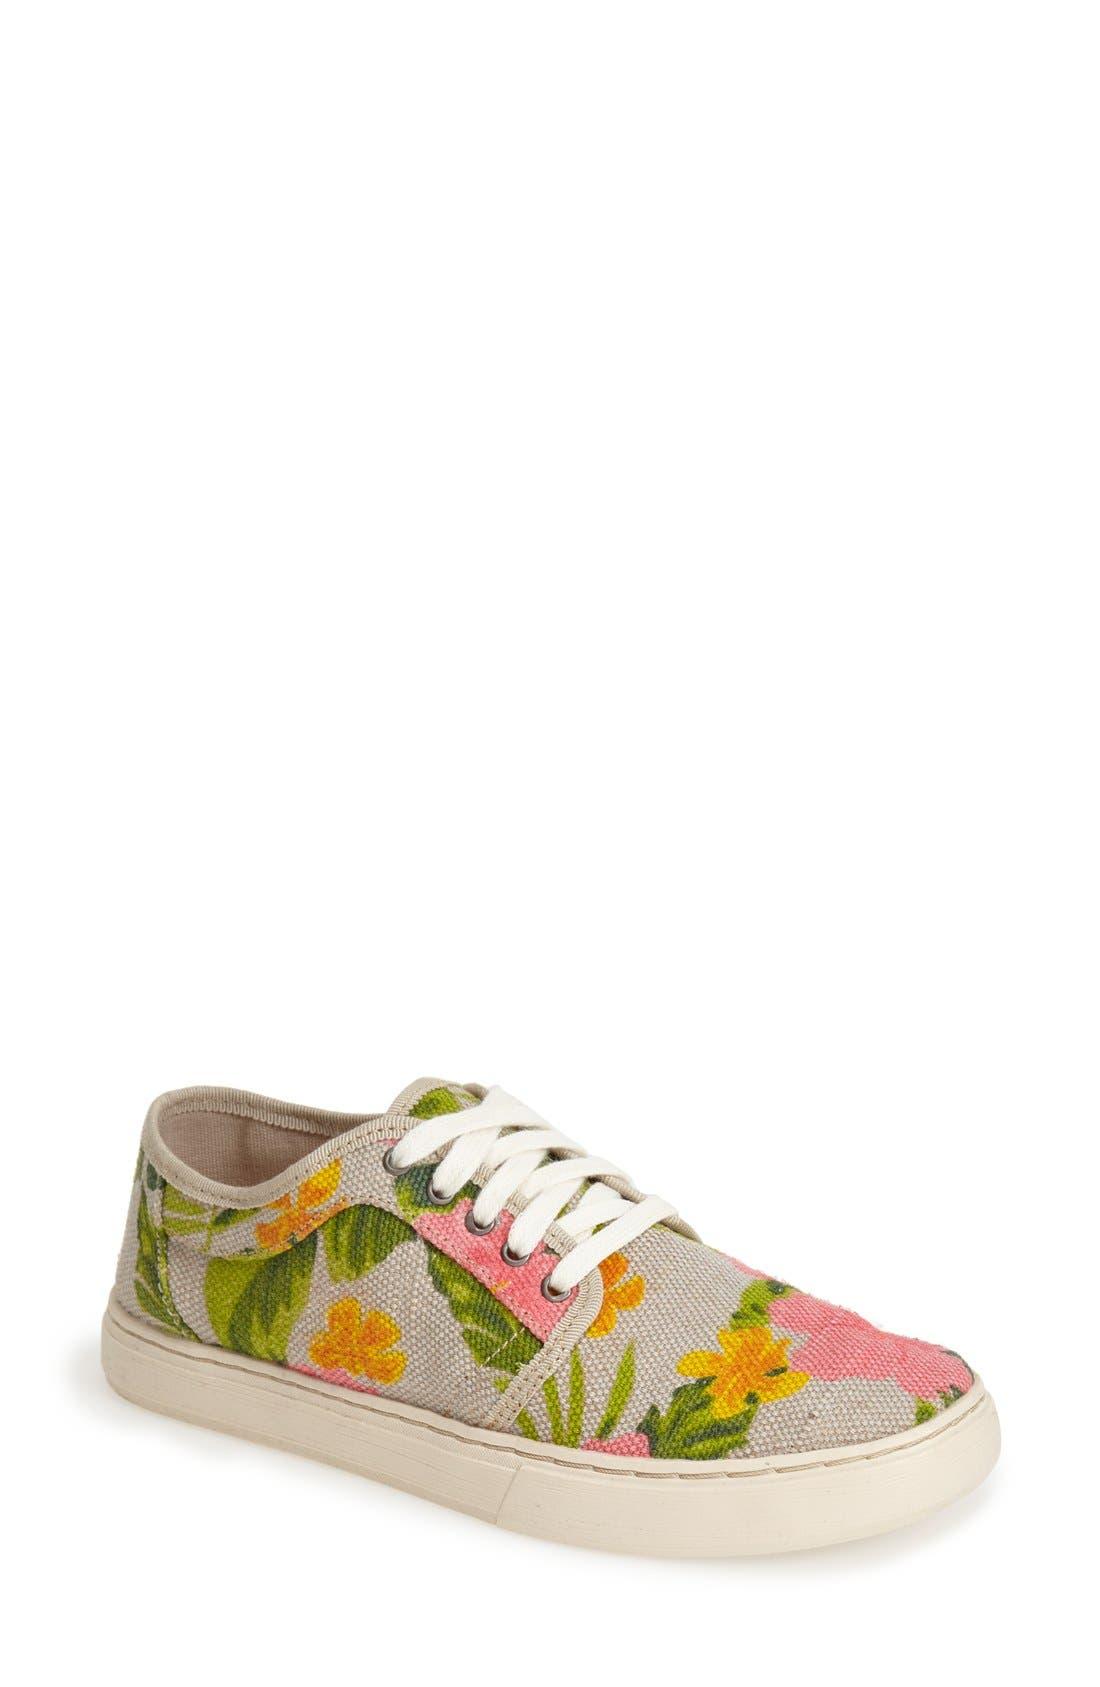 Alternate Image 1 Selected - Sole Society 'Kalin' Sneaker (Women)